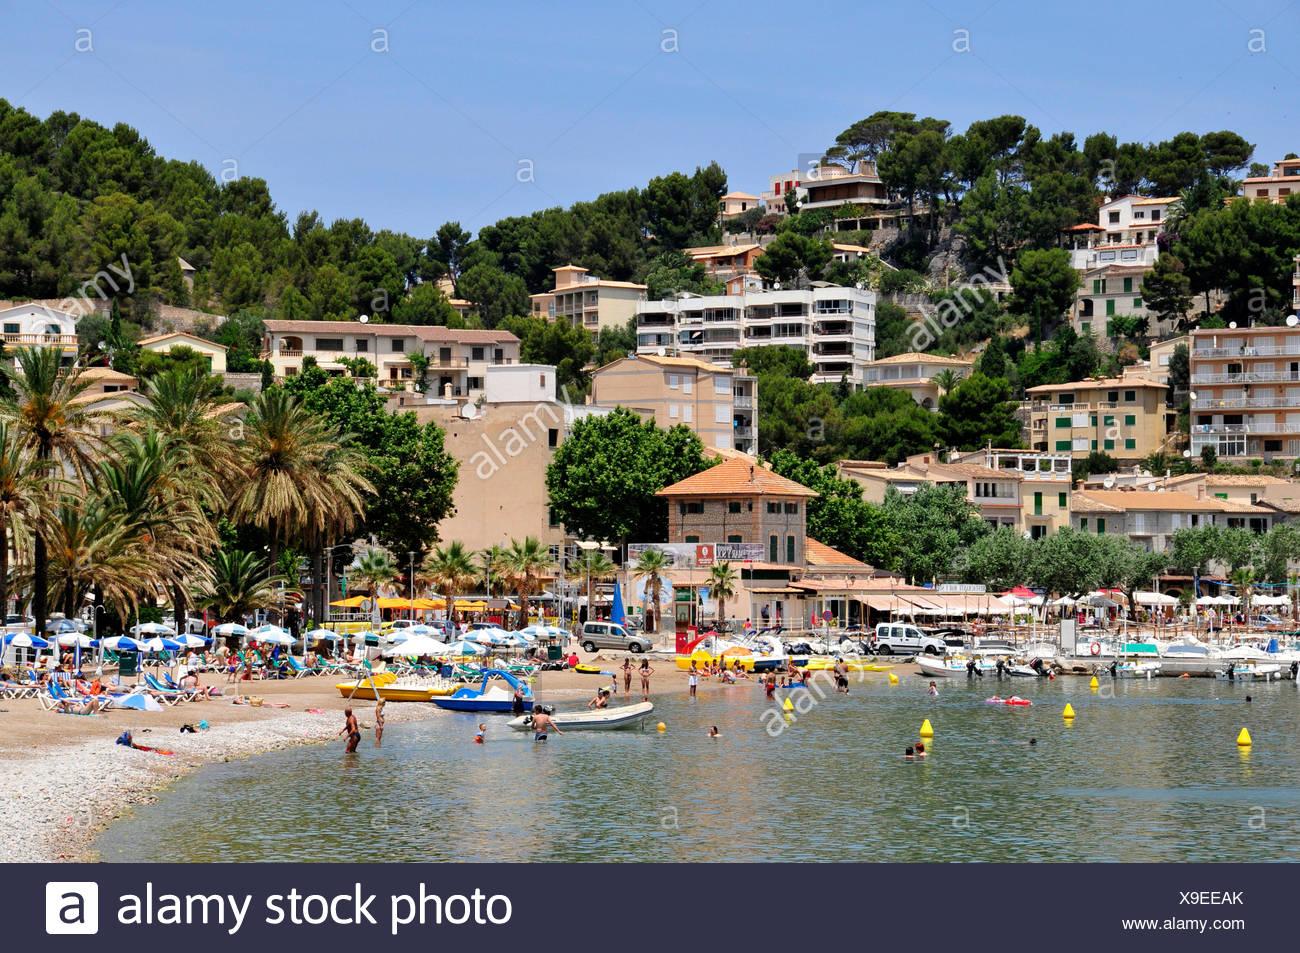 Beach of Platja des Través, Port de Soller, Majorca, Balearic Islands, Spain, Europe - Stock Image